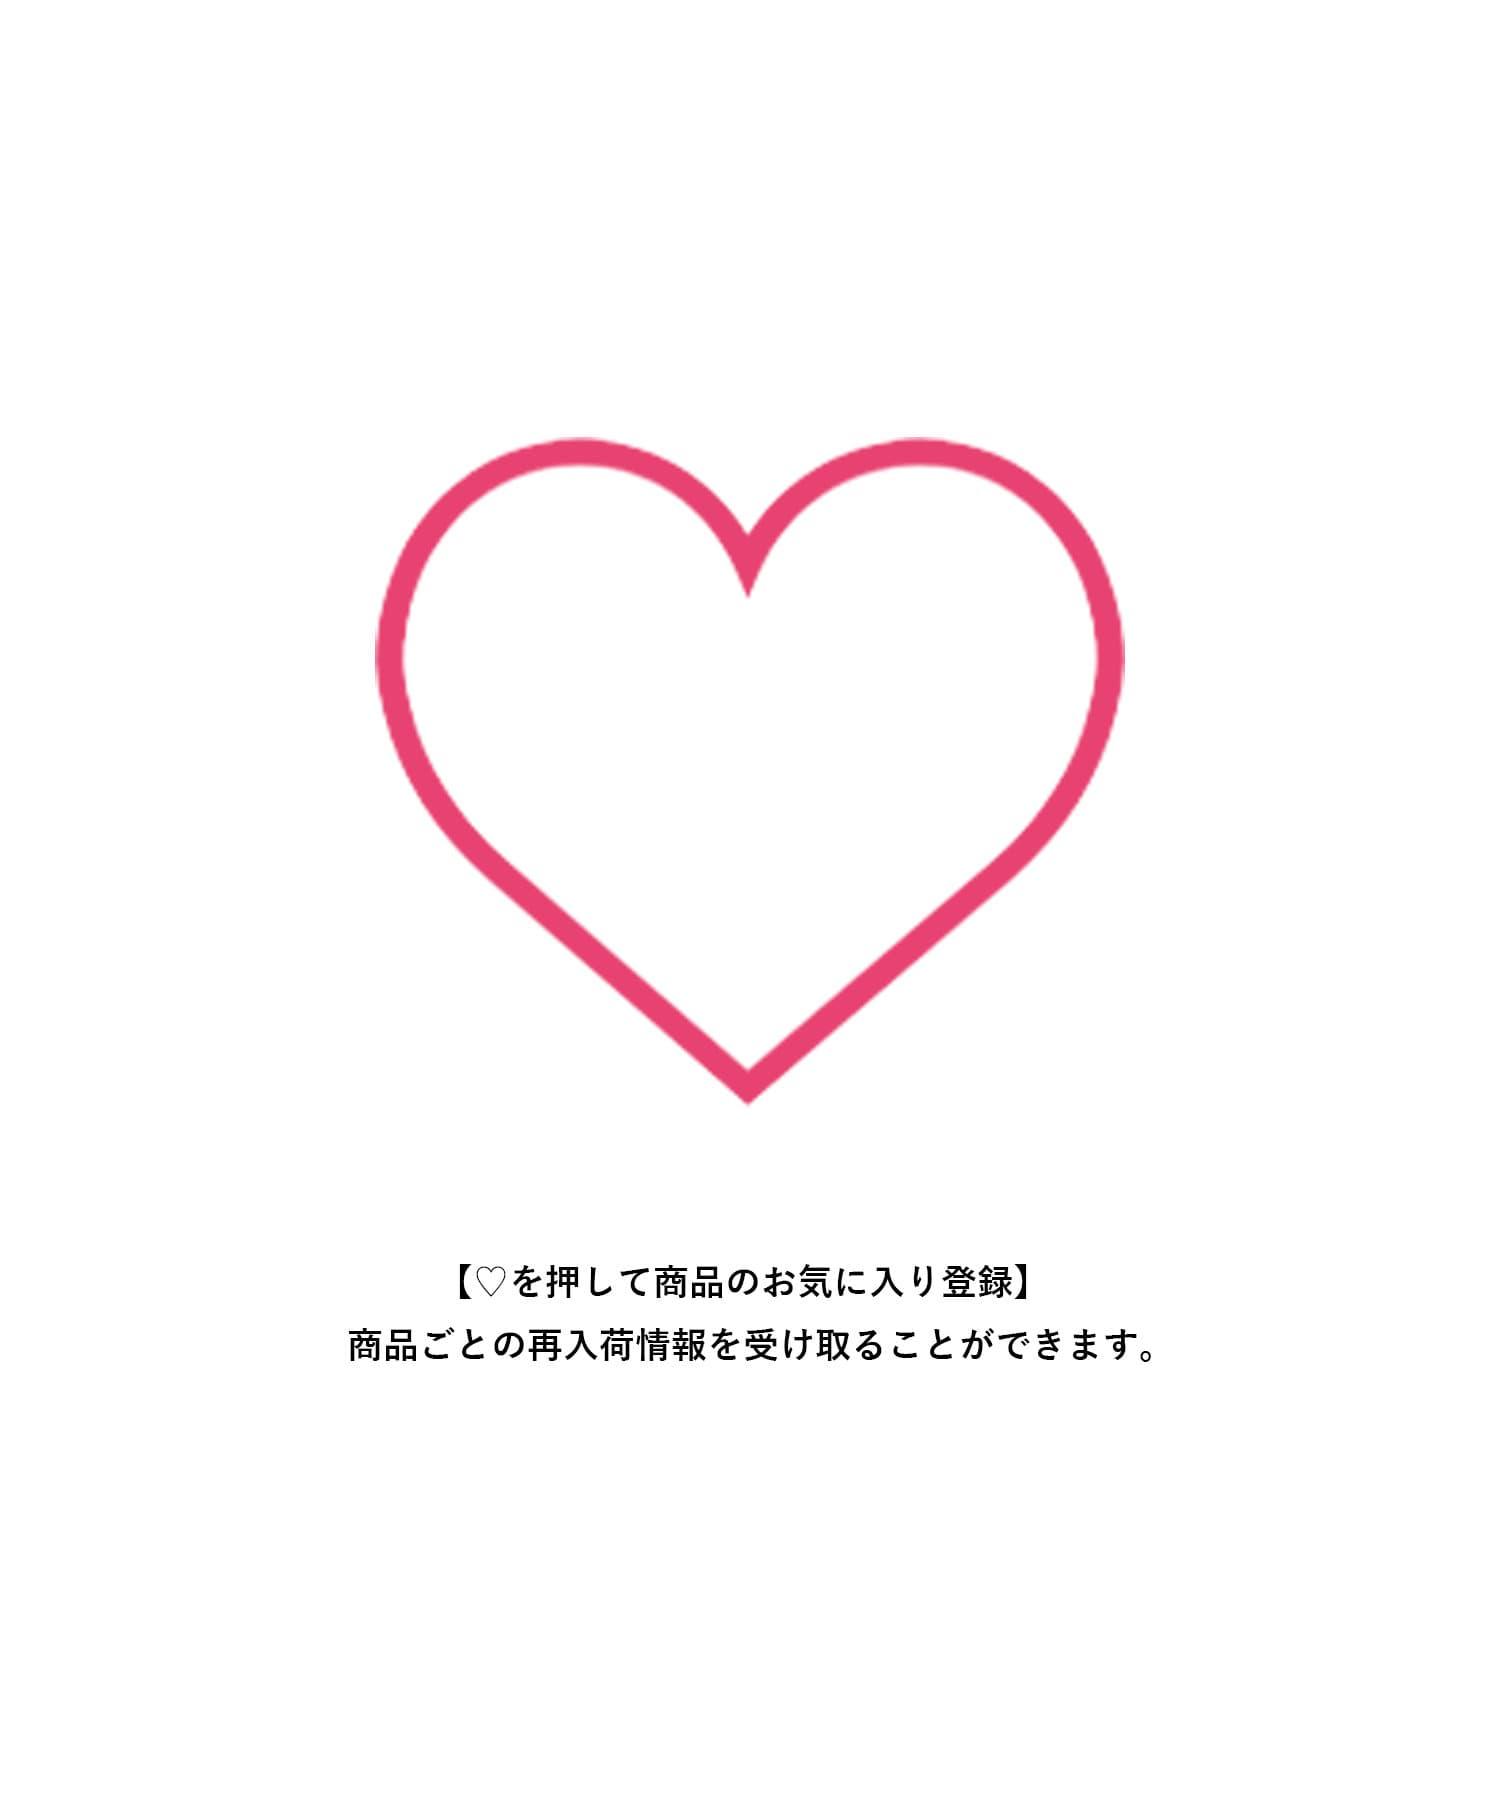 COLLAGE GALLARDAGALANTE(コラージュ ガリャルダガランテ) 【大人気☆残りわずか!】クールタッチノースリサマーニット